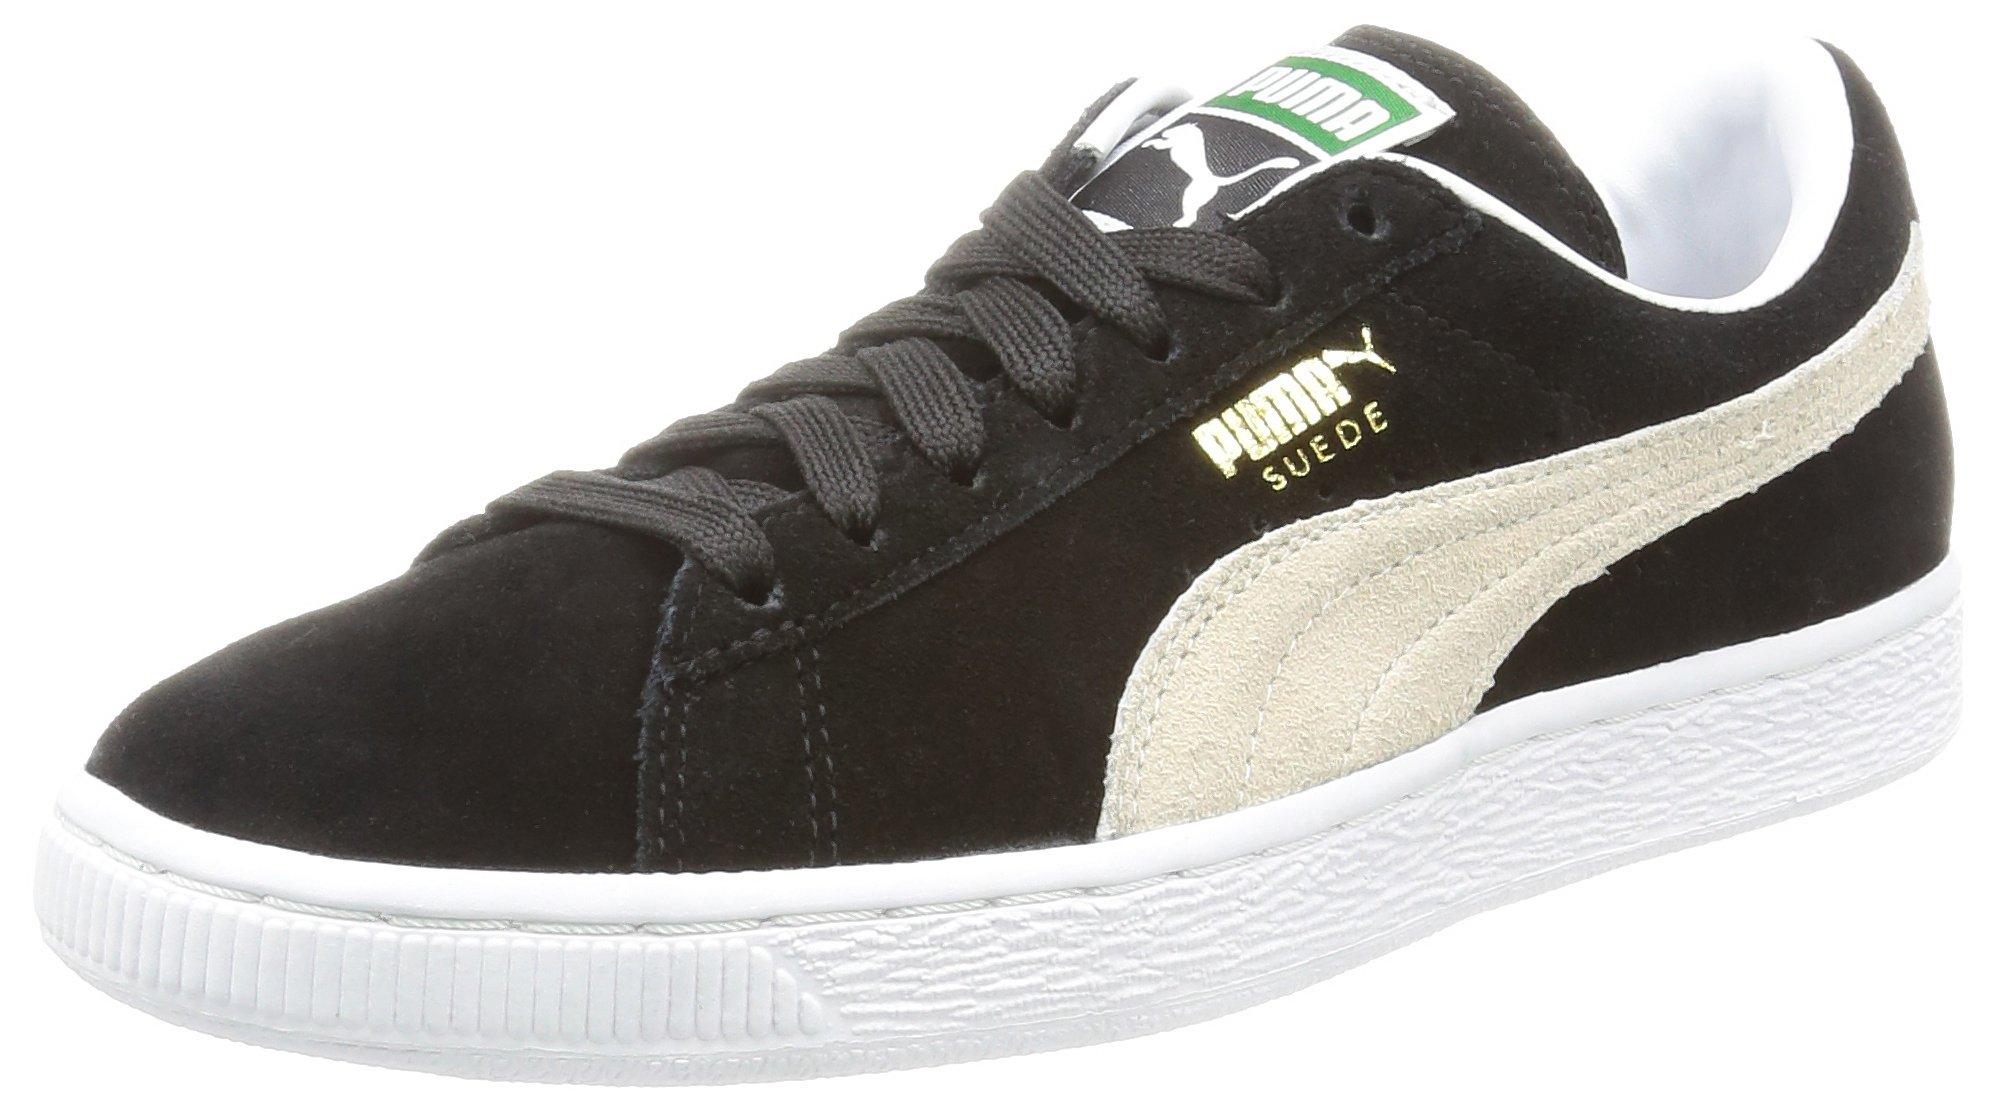 Puma Suede Classic+ Causal Basketball Shoes (US Men 4.5/ Eur 36/ 22.5 CM, Black- White)